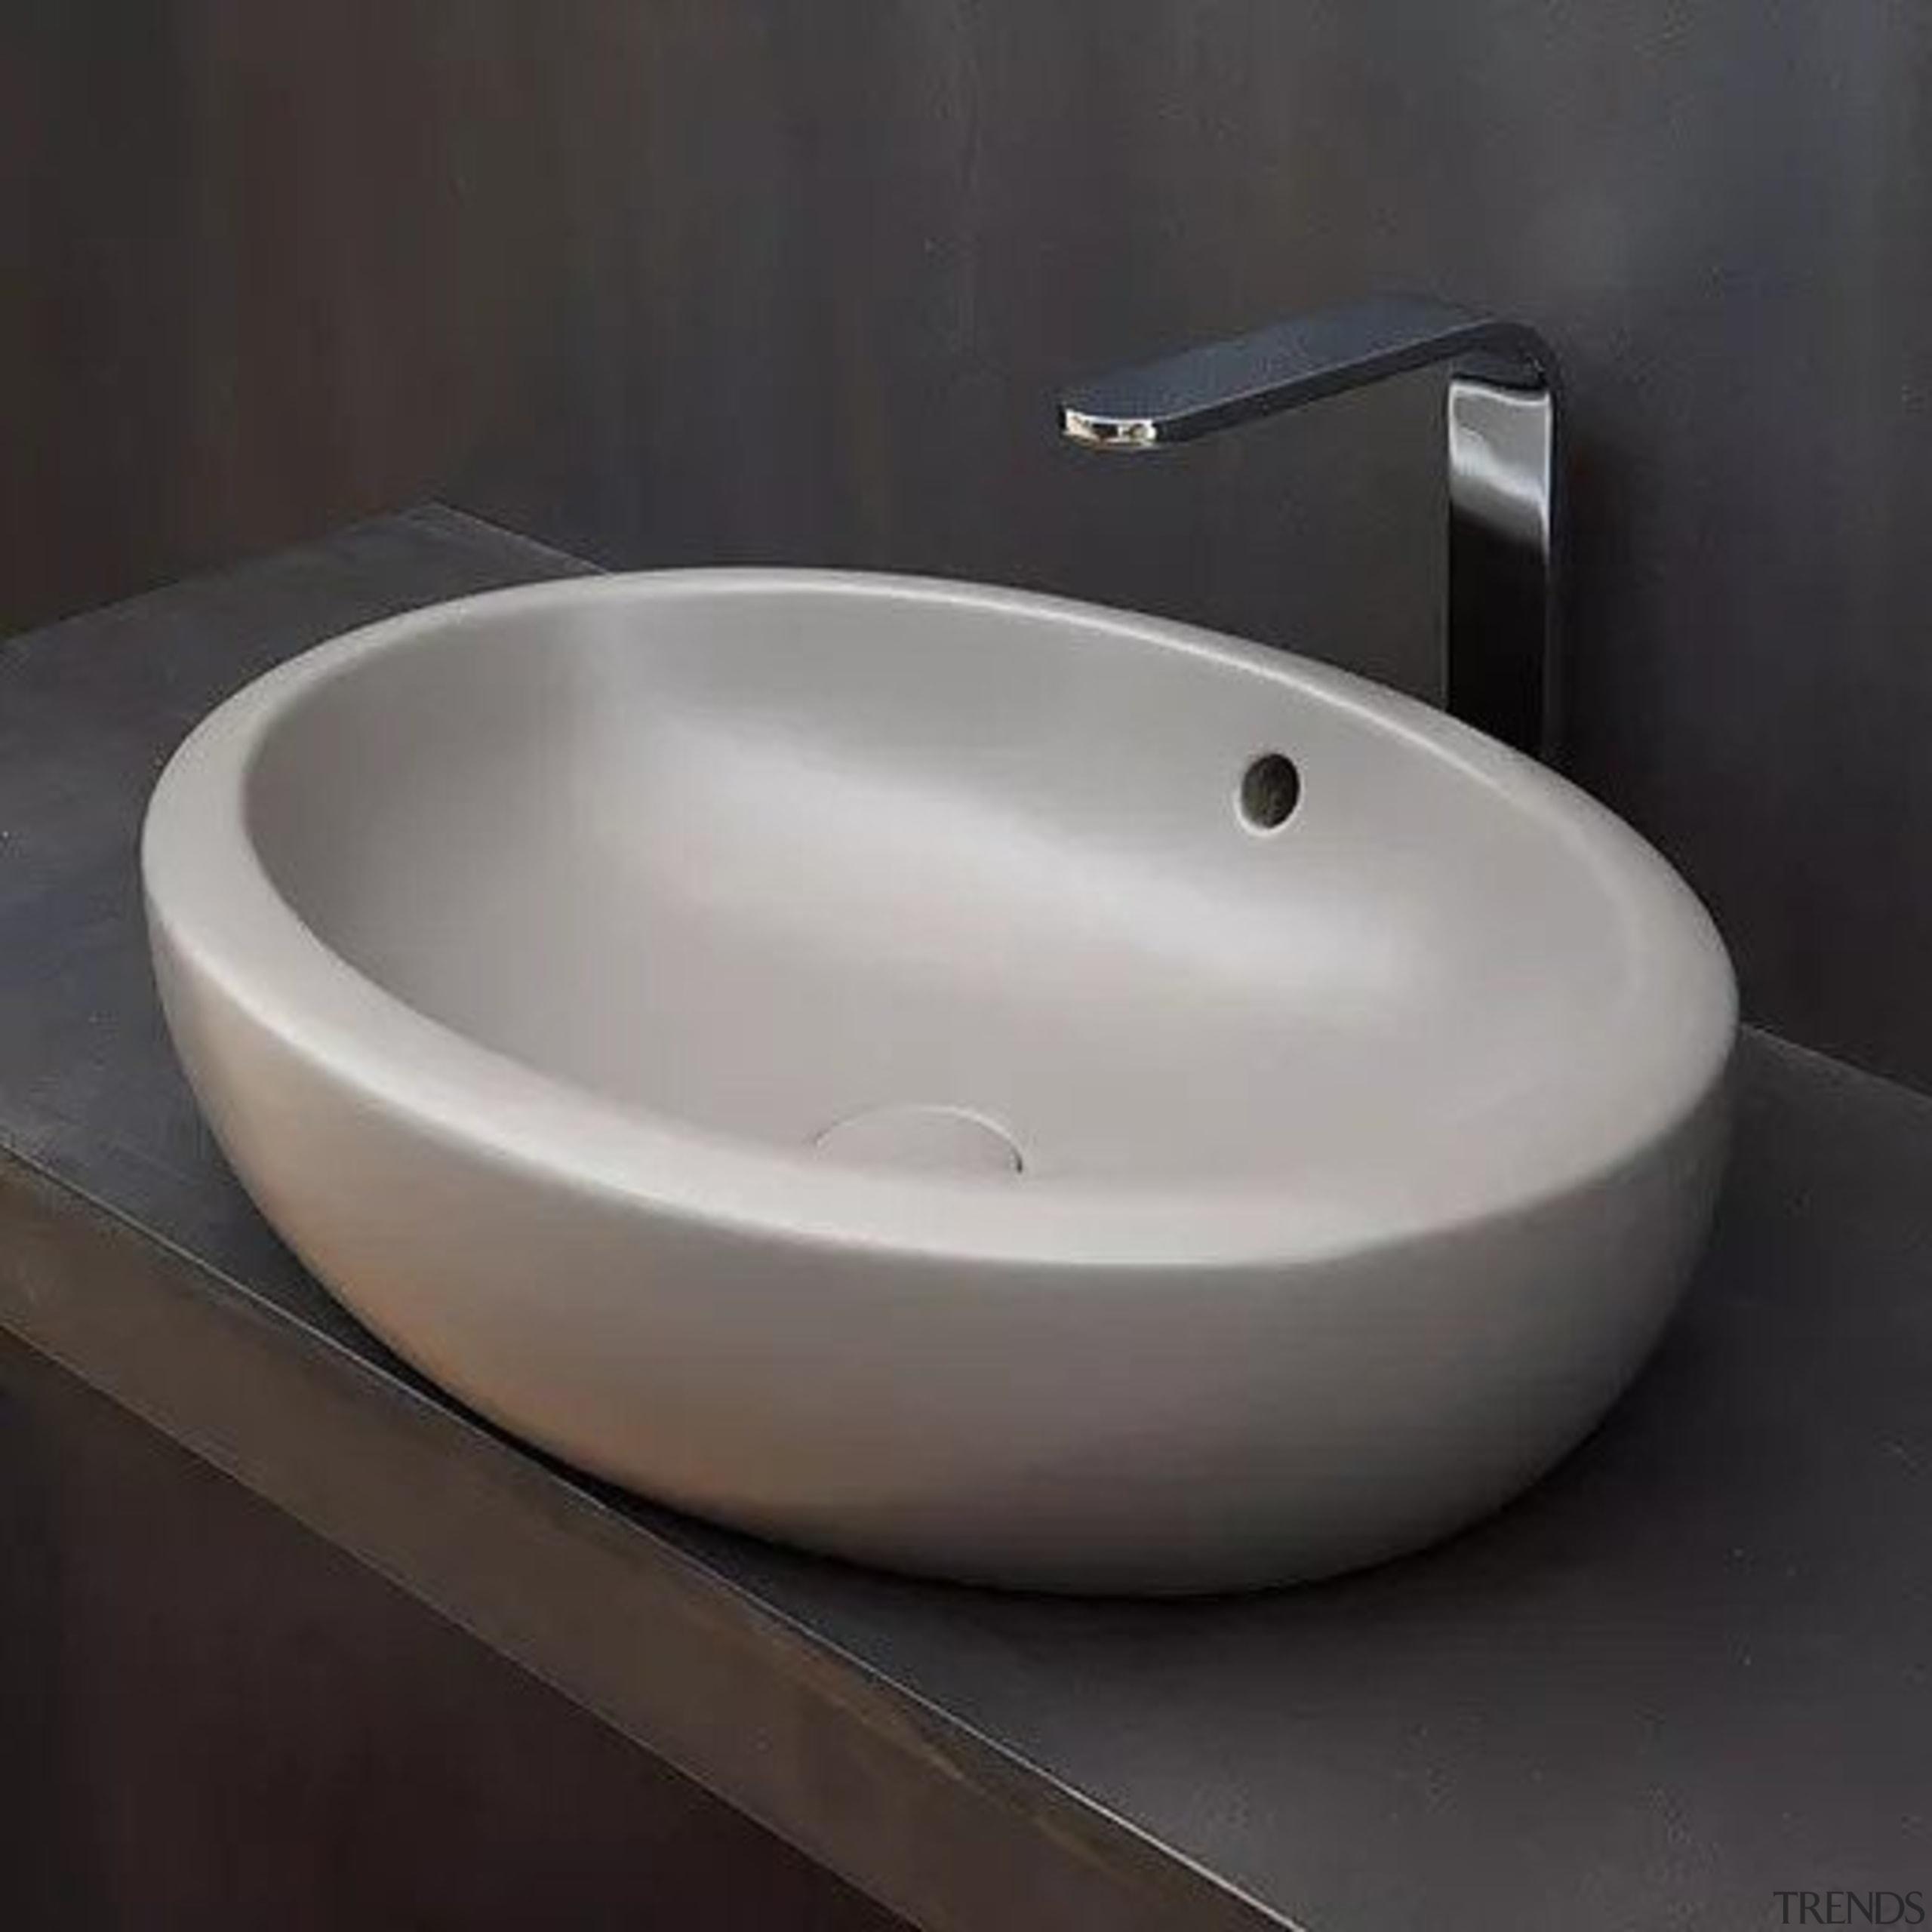 Fluid - bathroom sink | ceramic | plumbing bathroom sink, ceramic, plumbing fixture, product design, sink, tap, black, gray